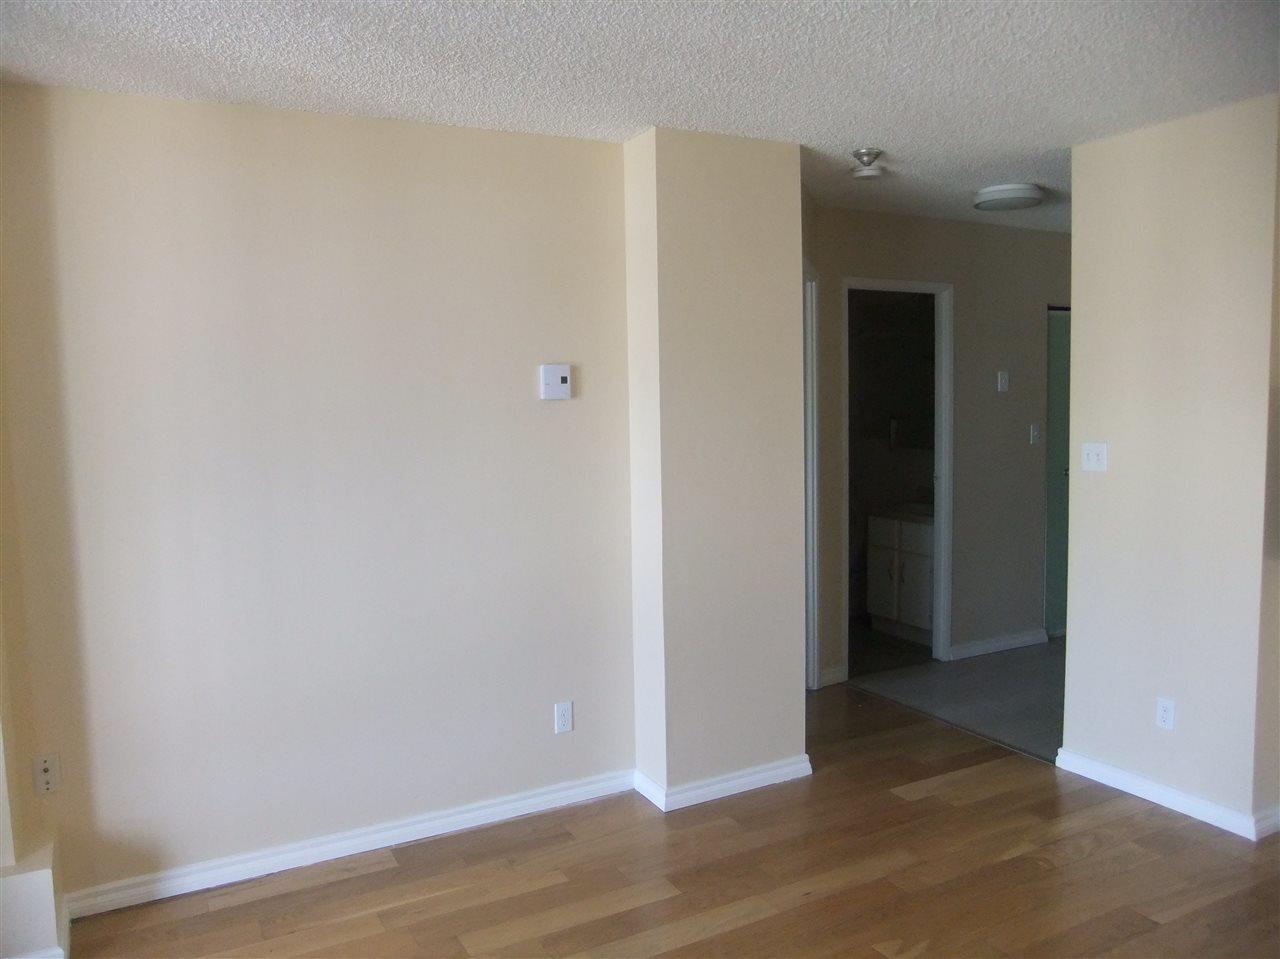 #608 12831 66 St Nw, Edmonton, Alberta  T5C 0A4 - Photo 5 - E4234921